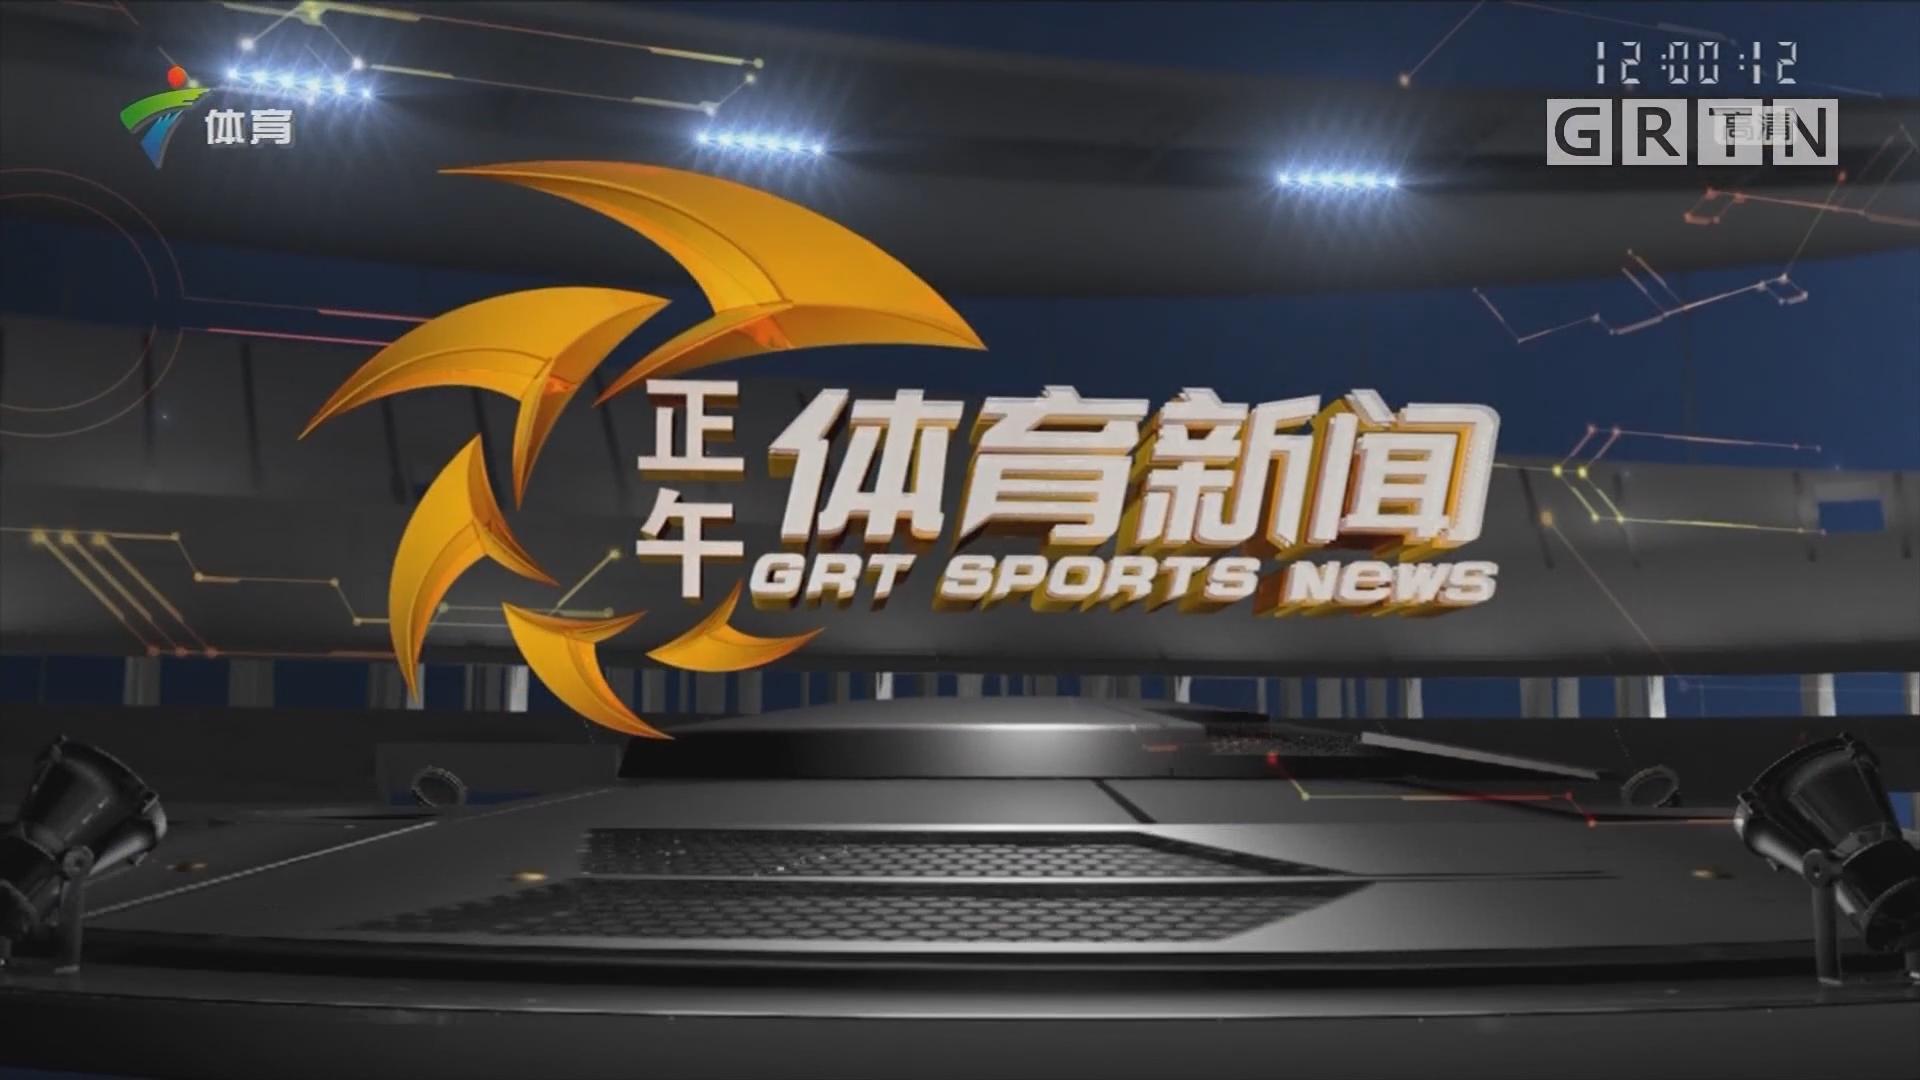 [HD][2019-07-31]正午体育新闻:恒大开放日 数人缺席训练 卡帅回应伤病情况